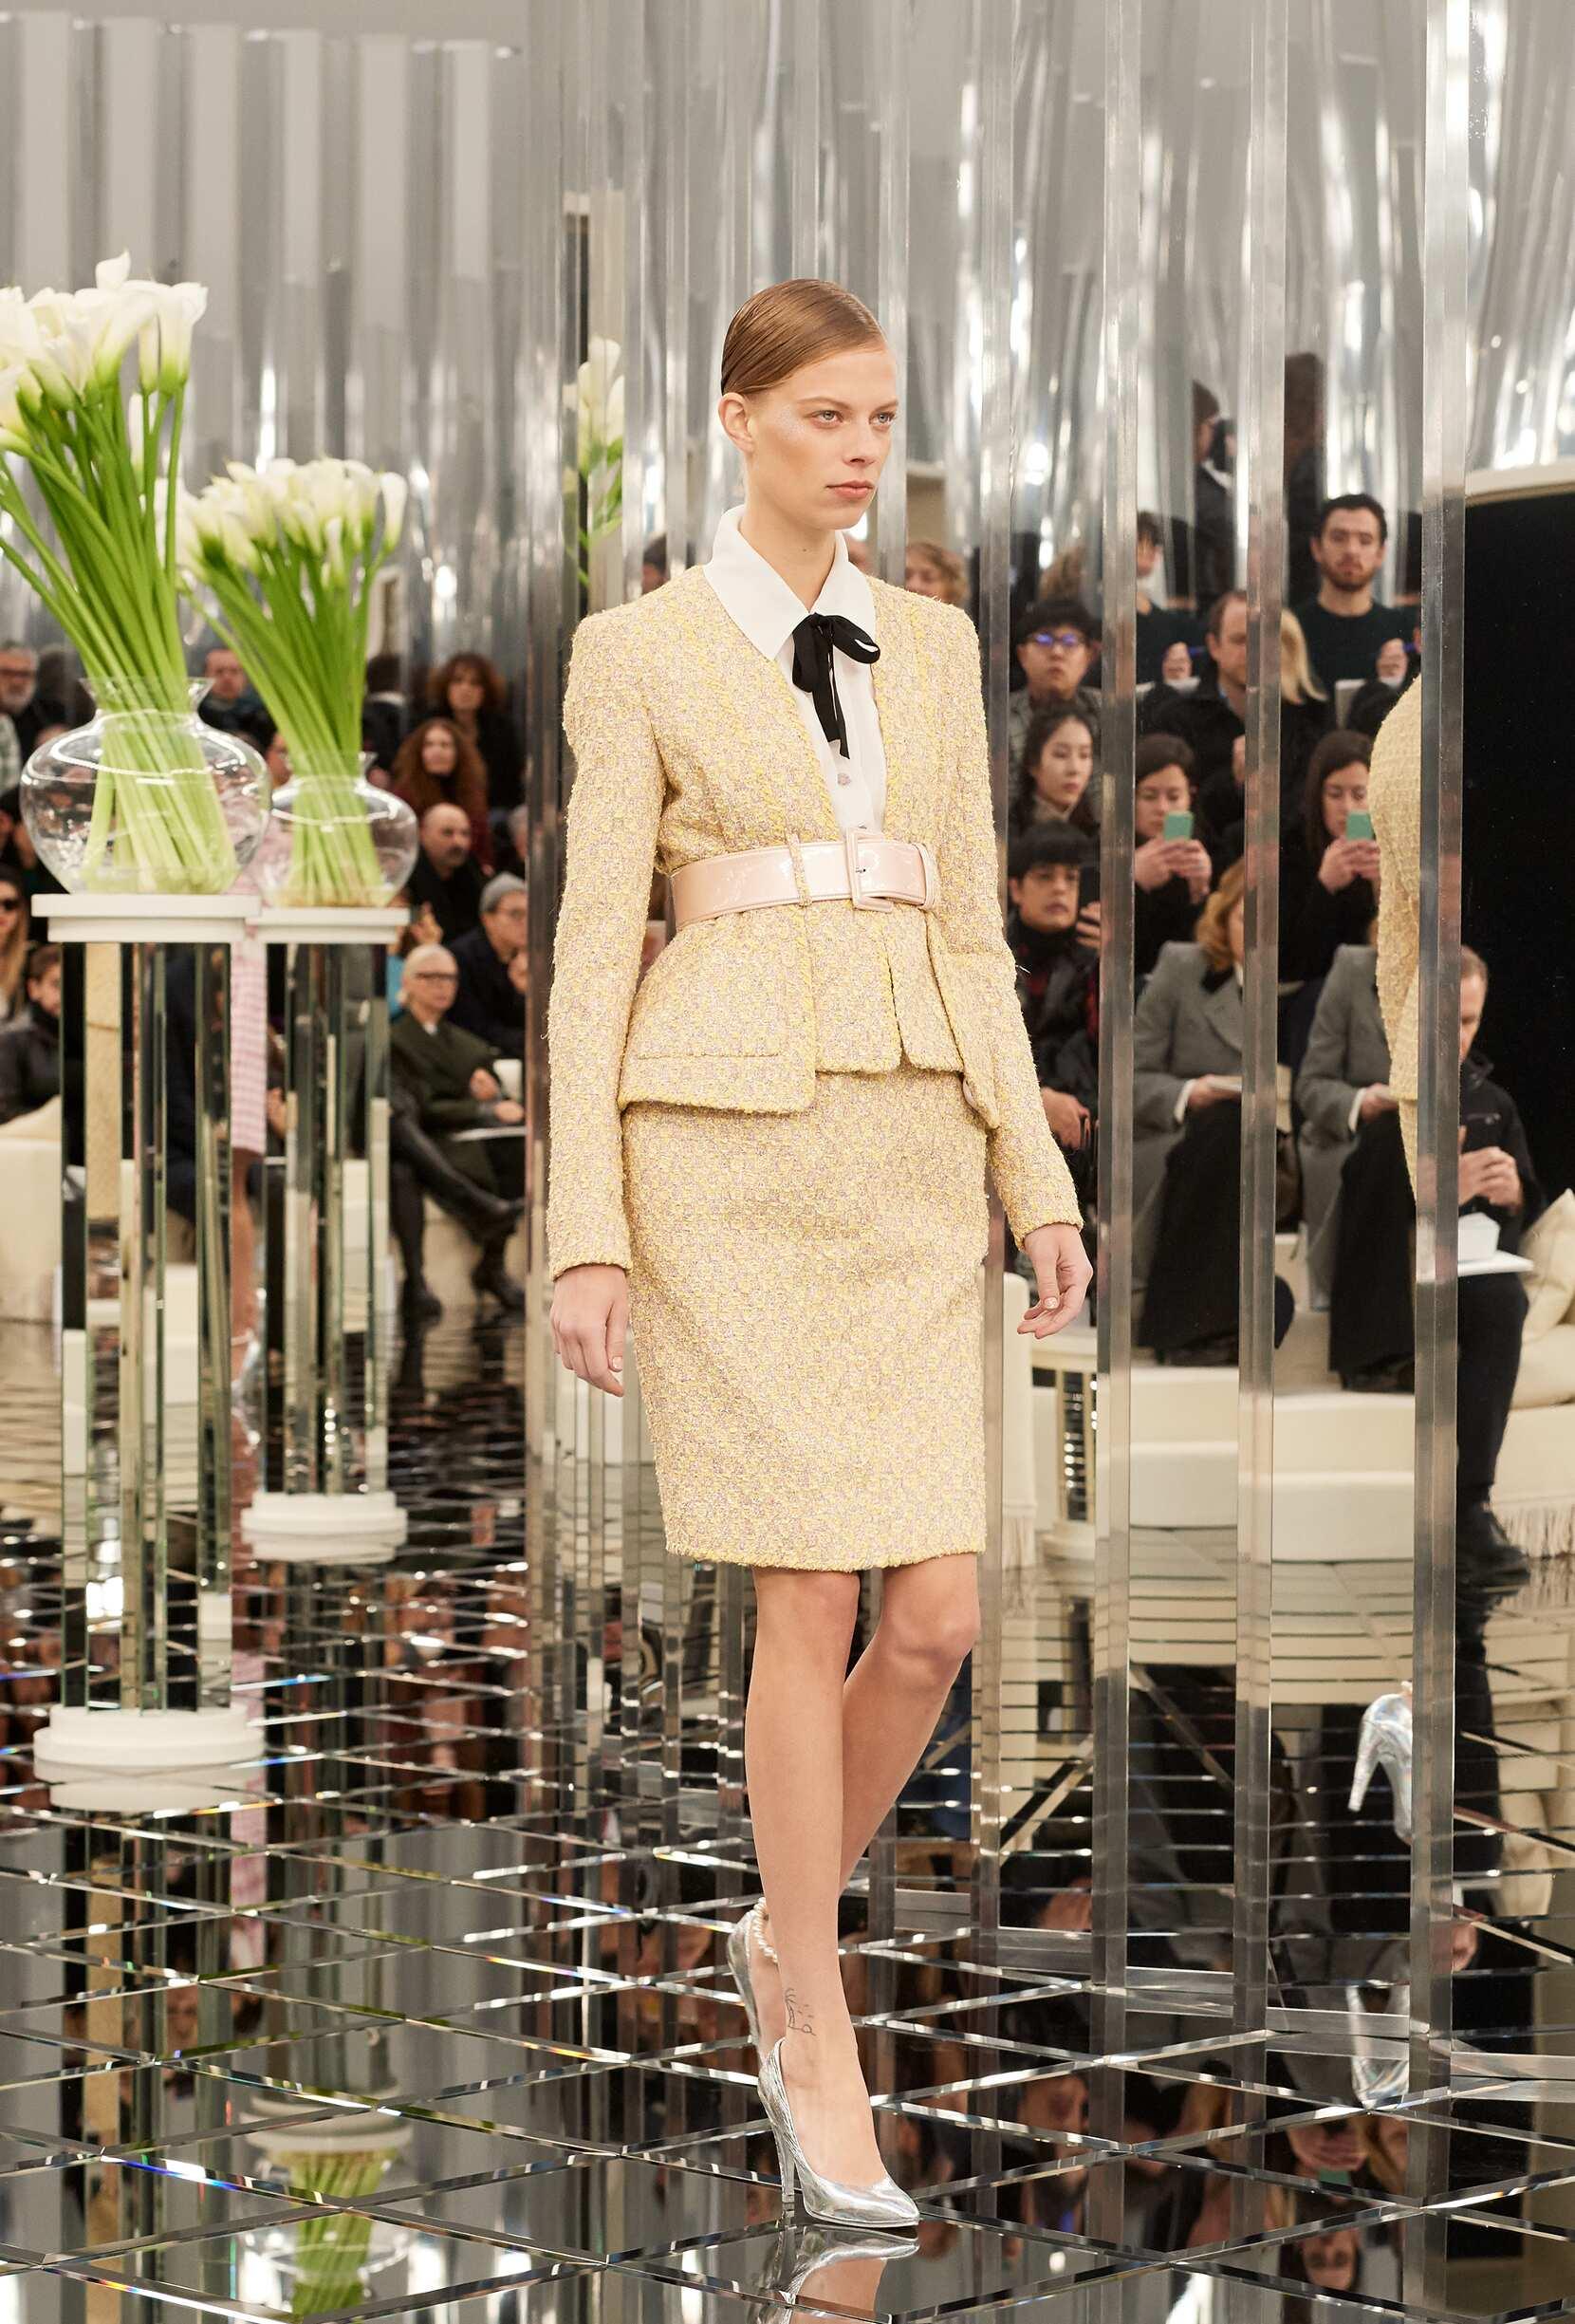 SS 2017 Chanel Haute Couture Fashion Show Woman